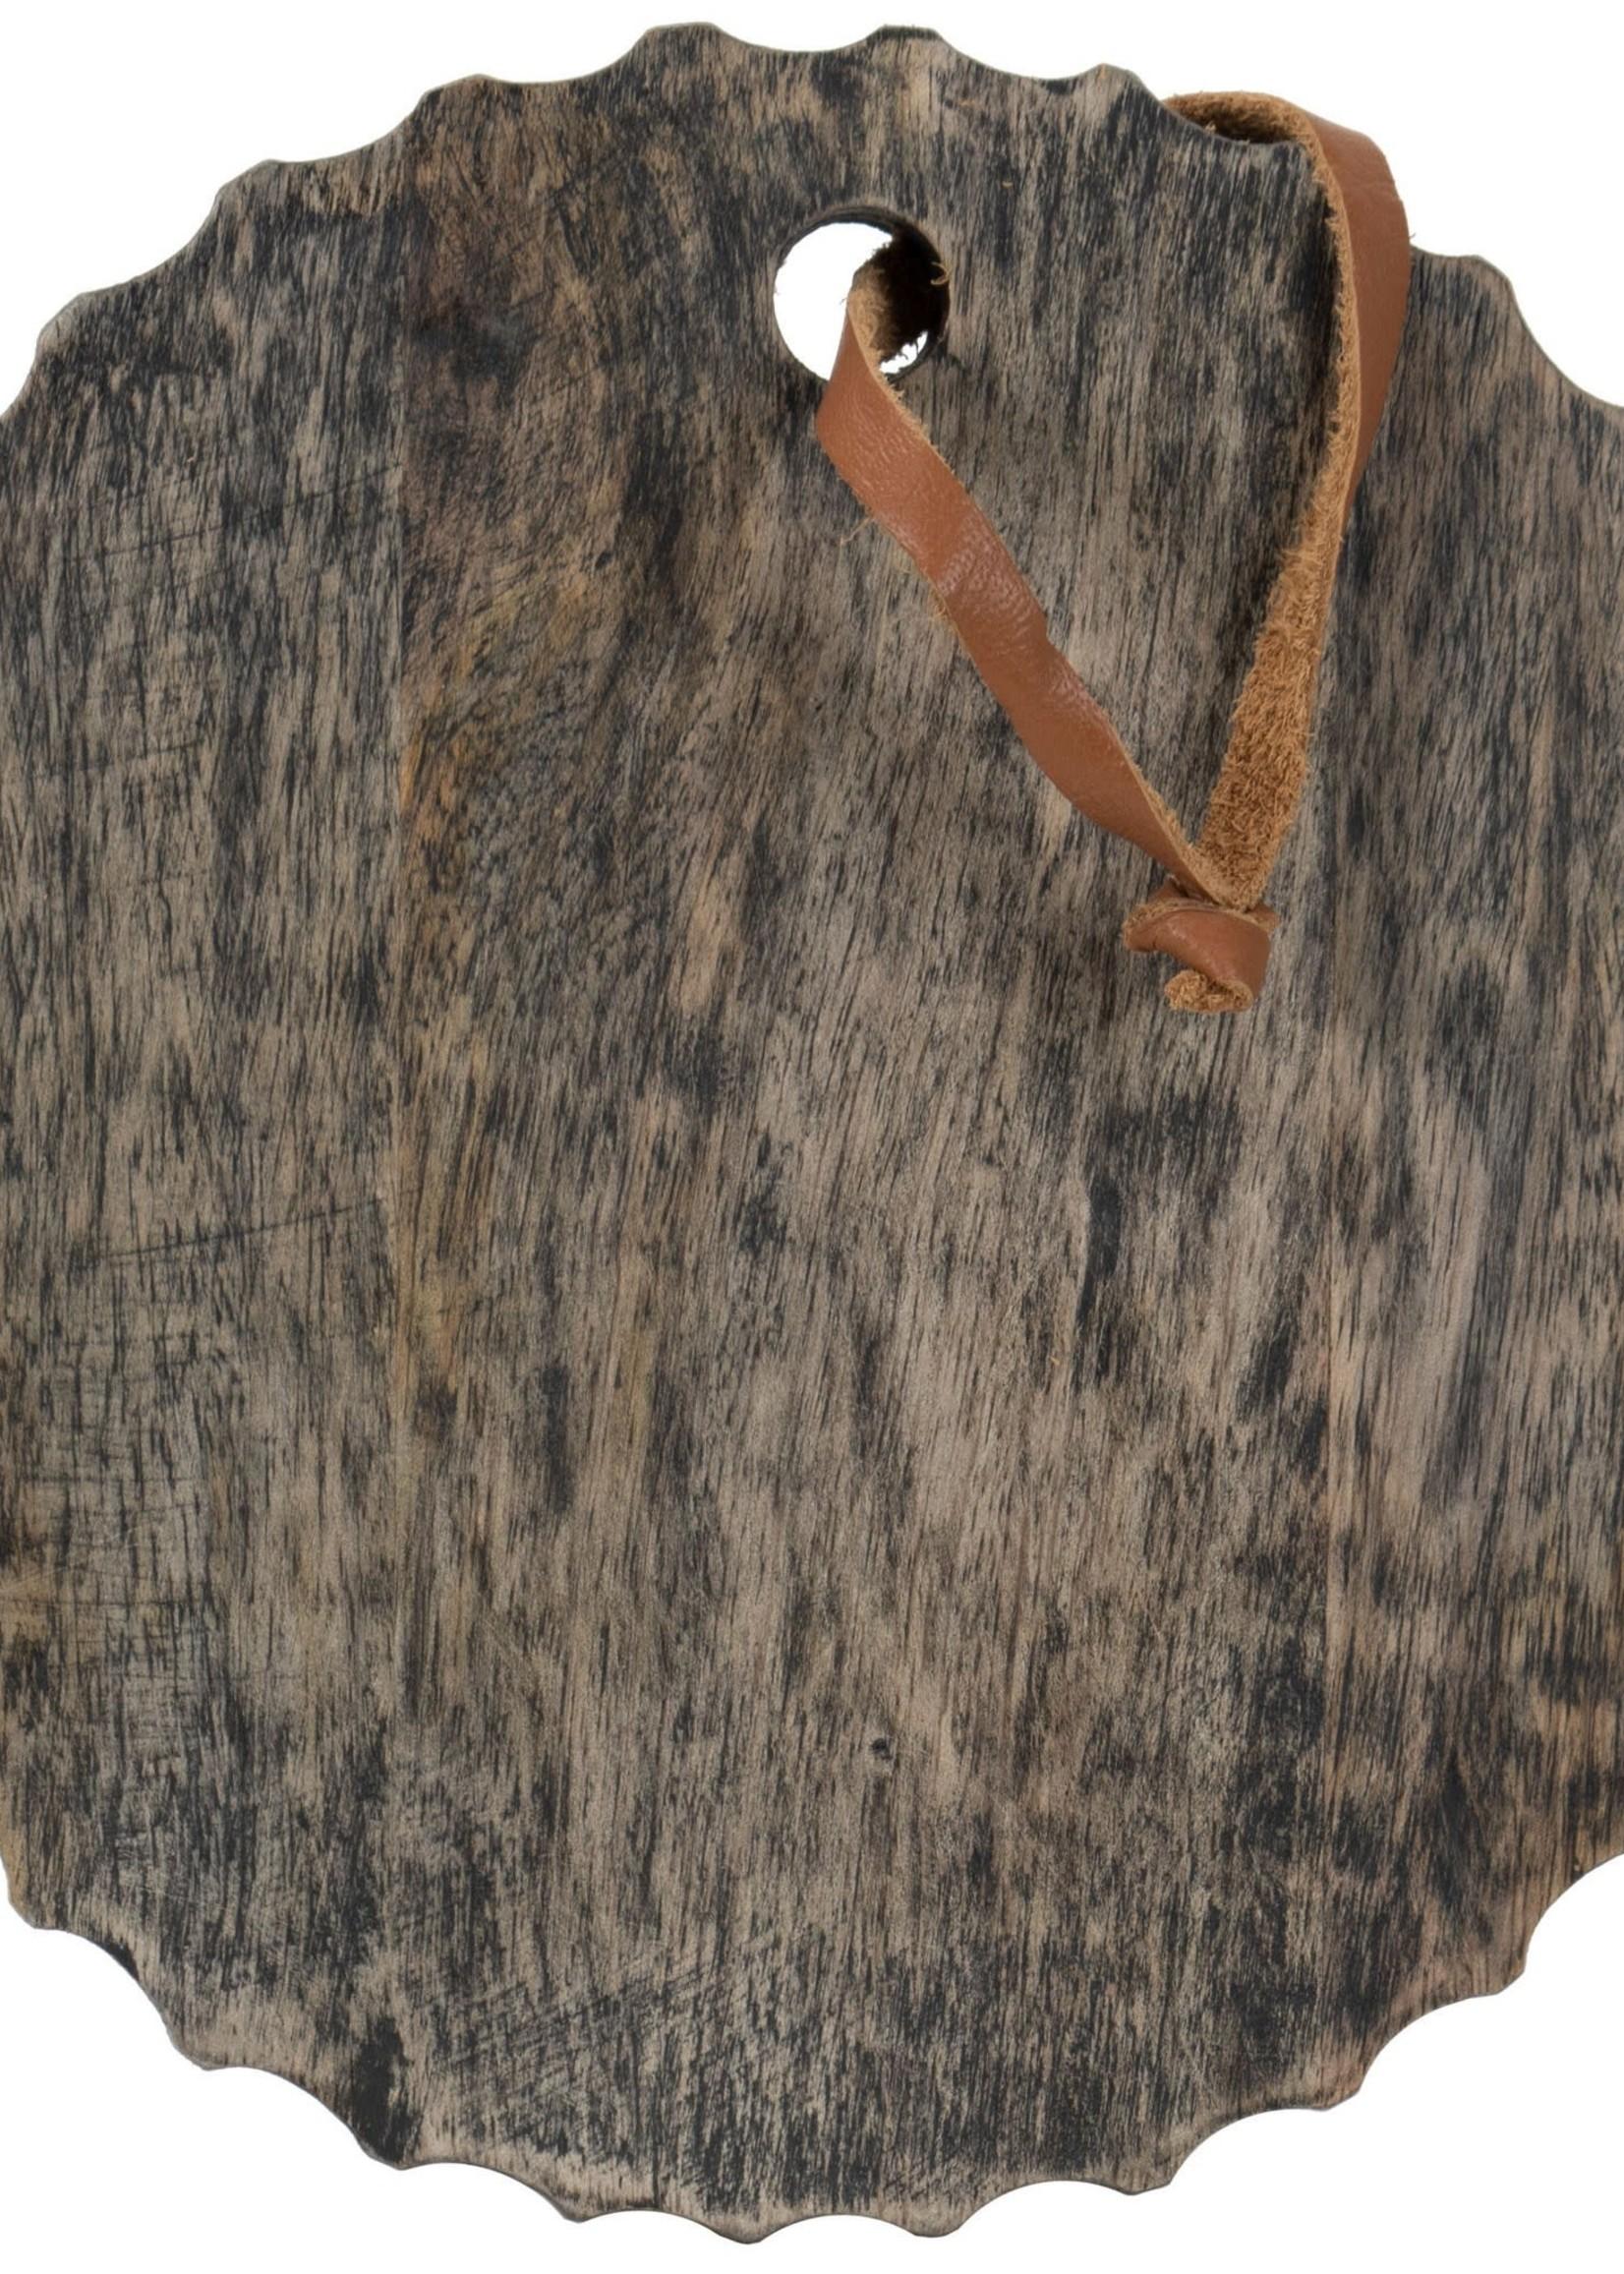 Carved Round Board Black